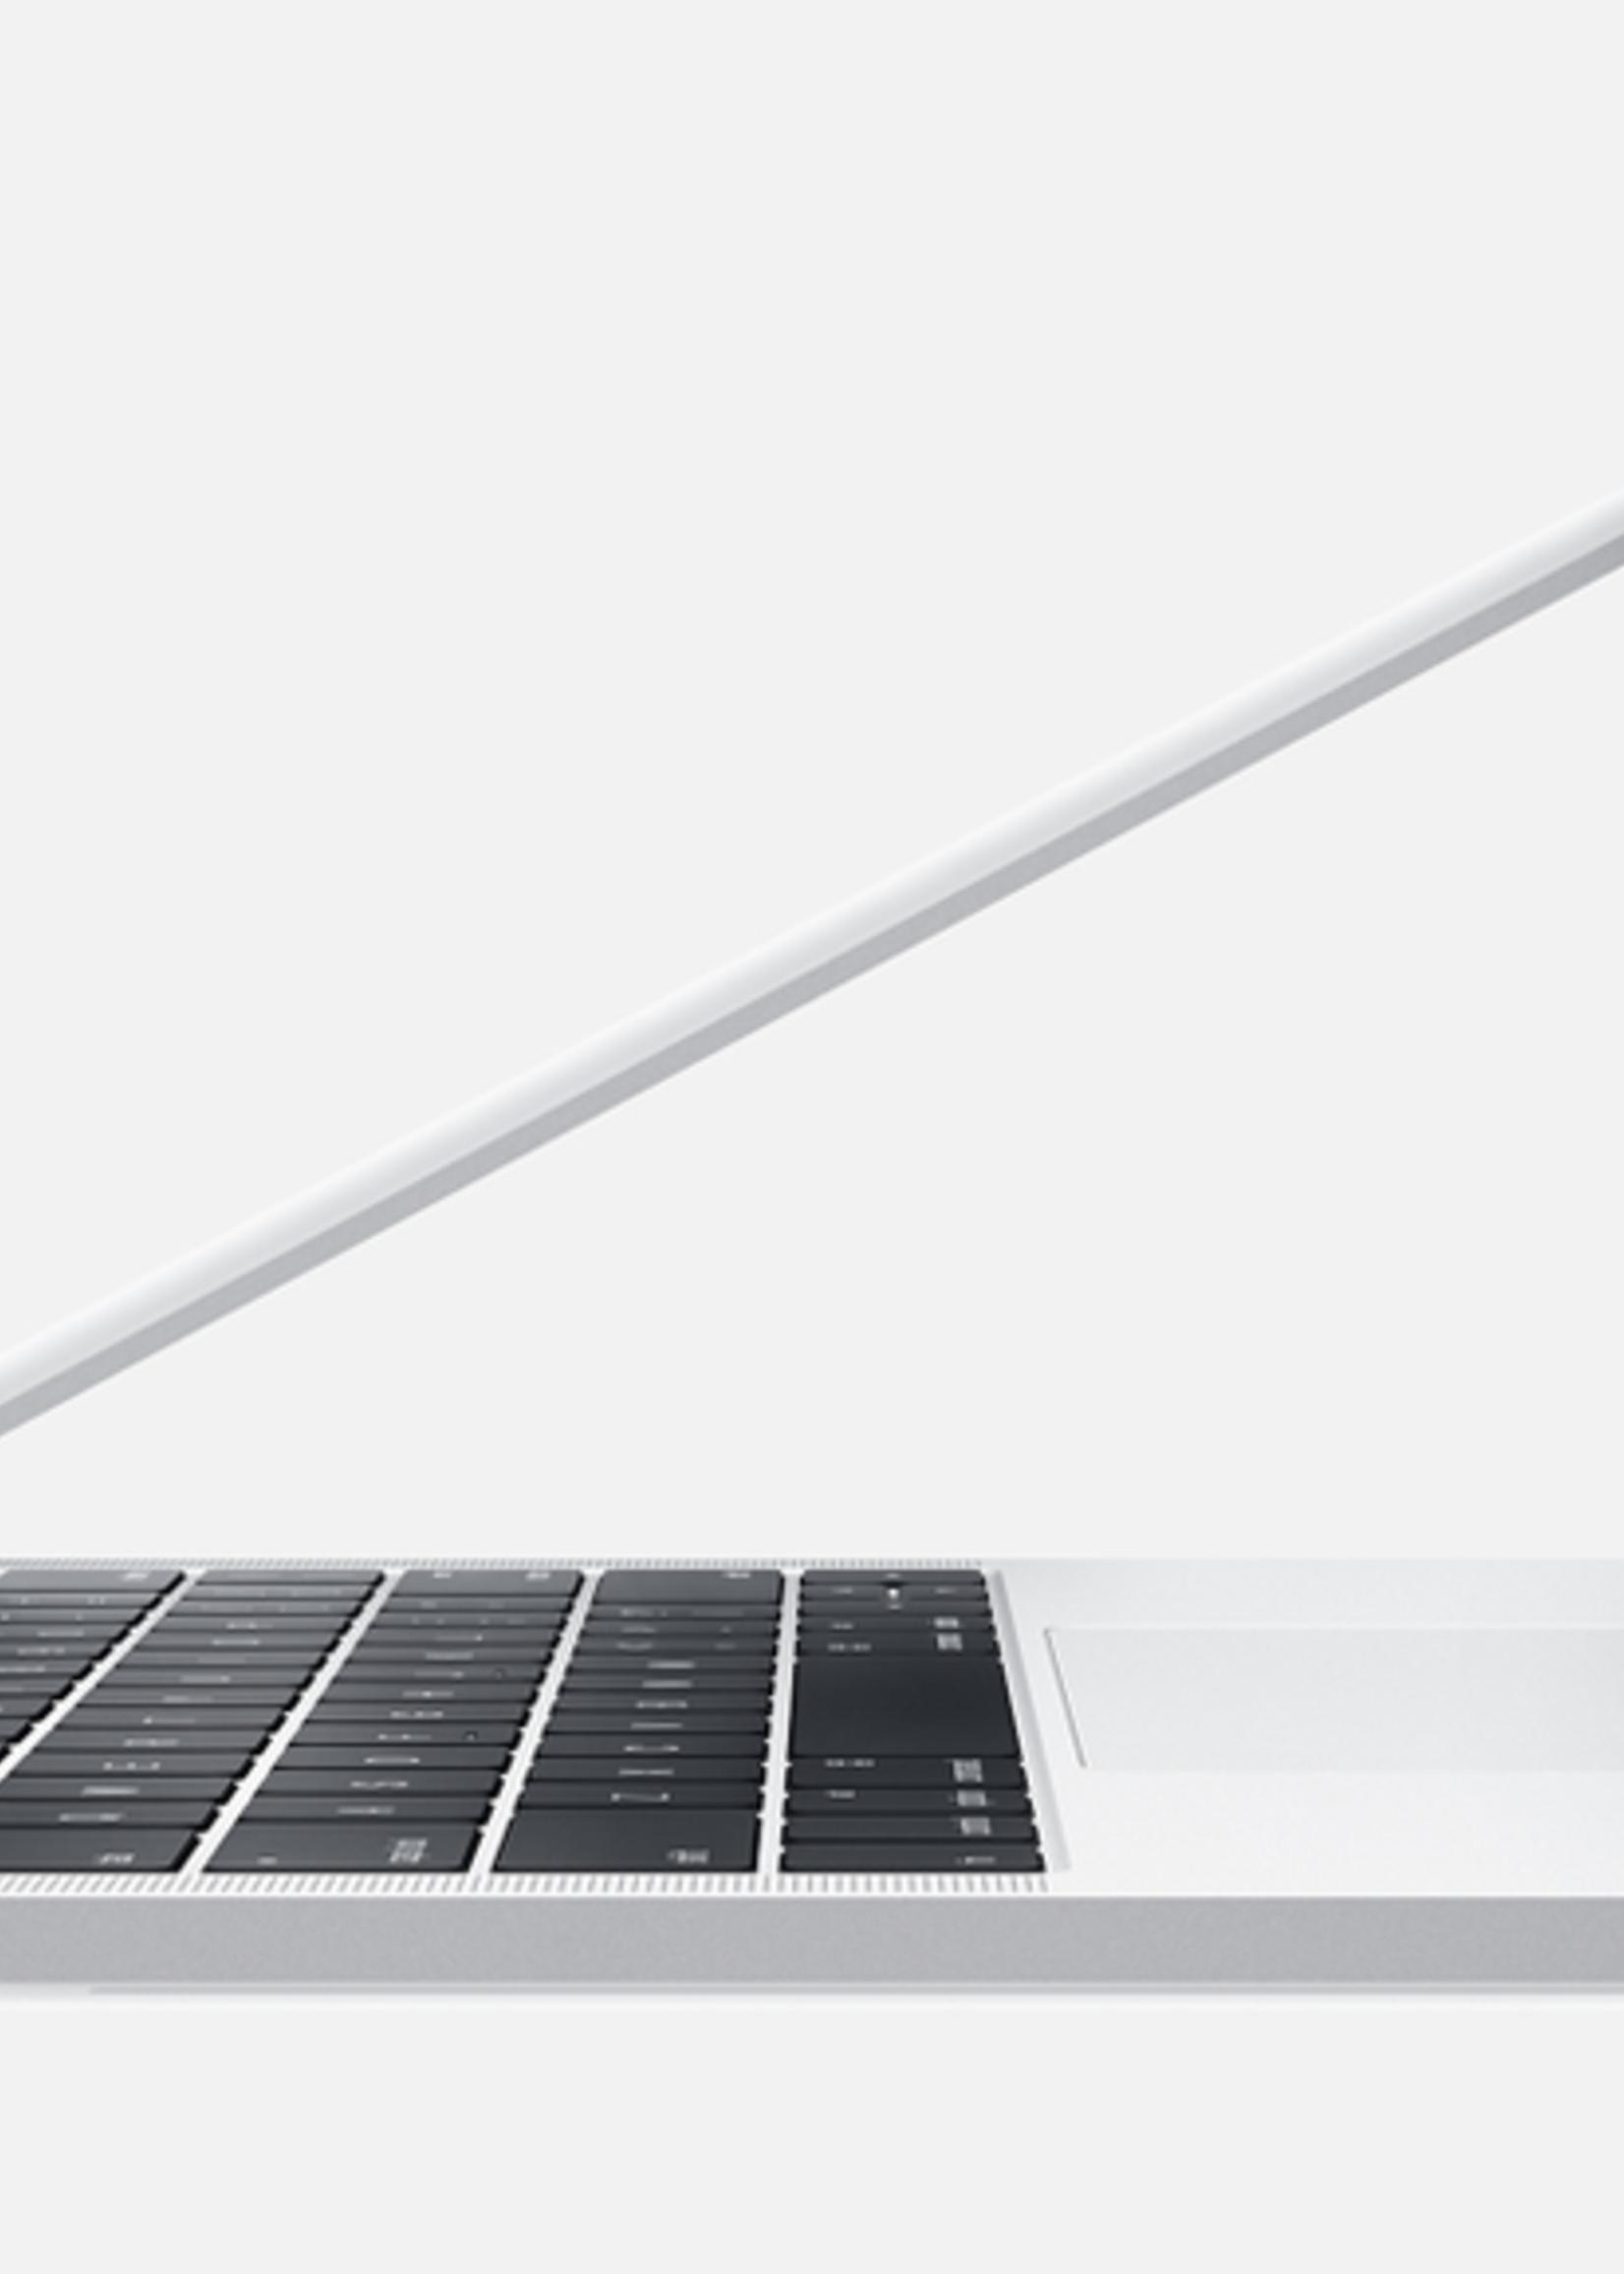 "13"" MacBook Pro w/ touch bar - 512GB - Silver - 2.4GHz"